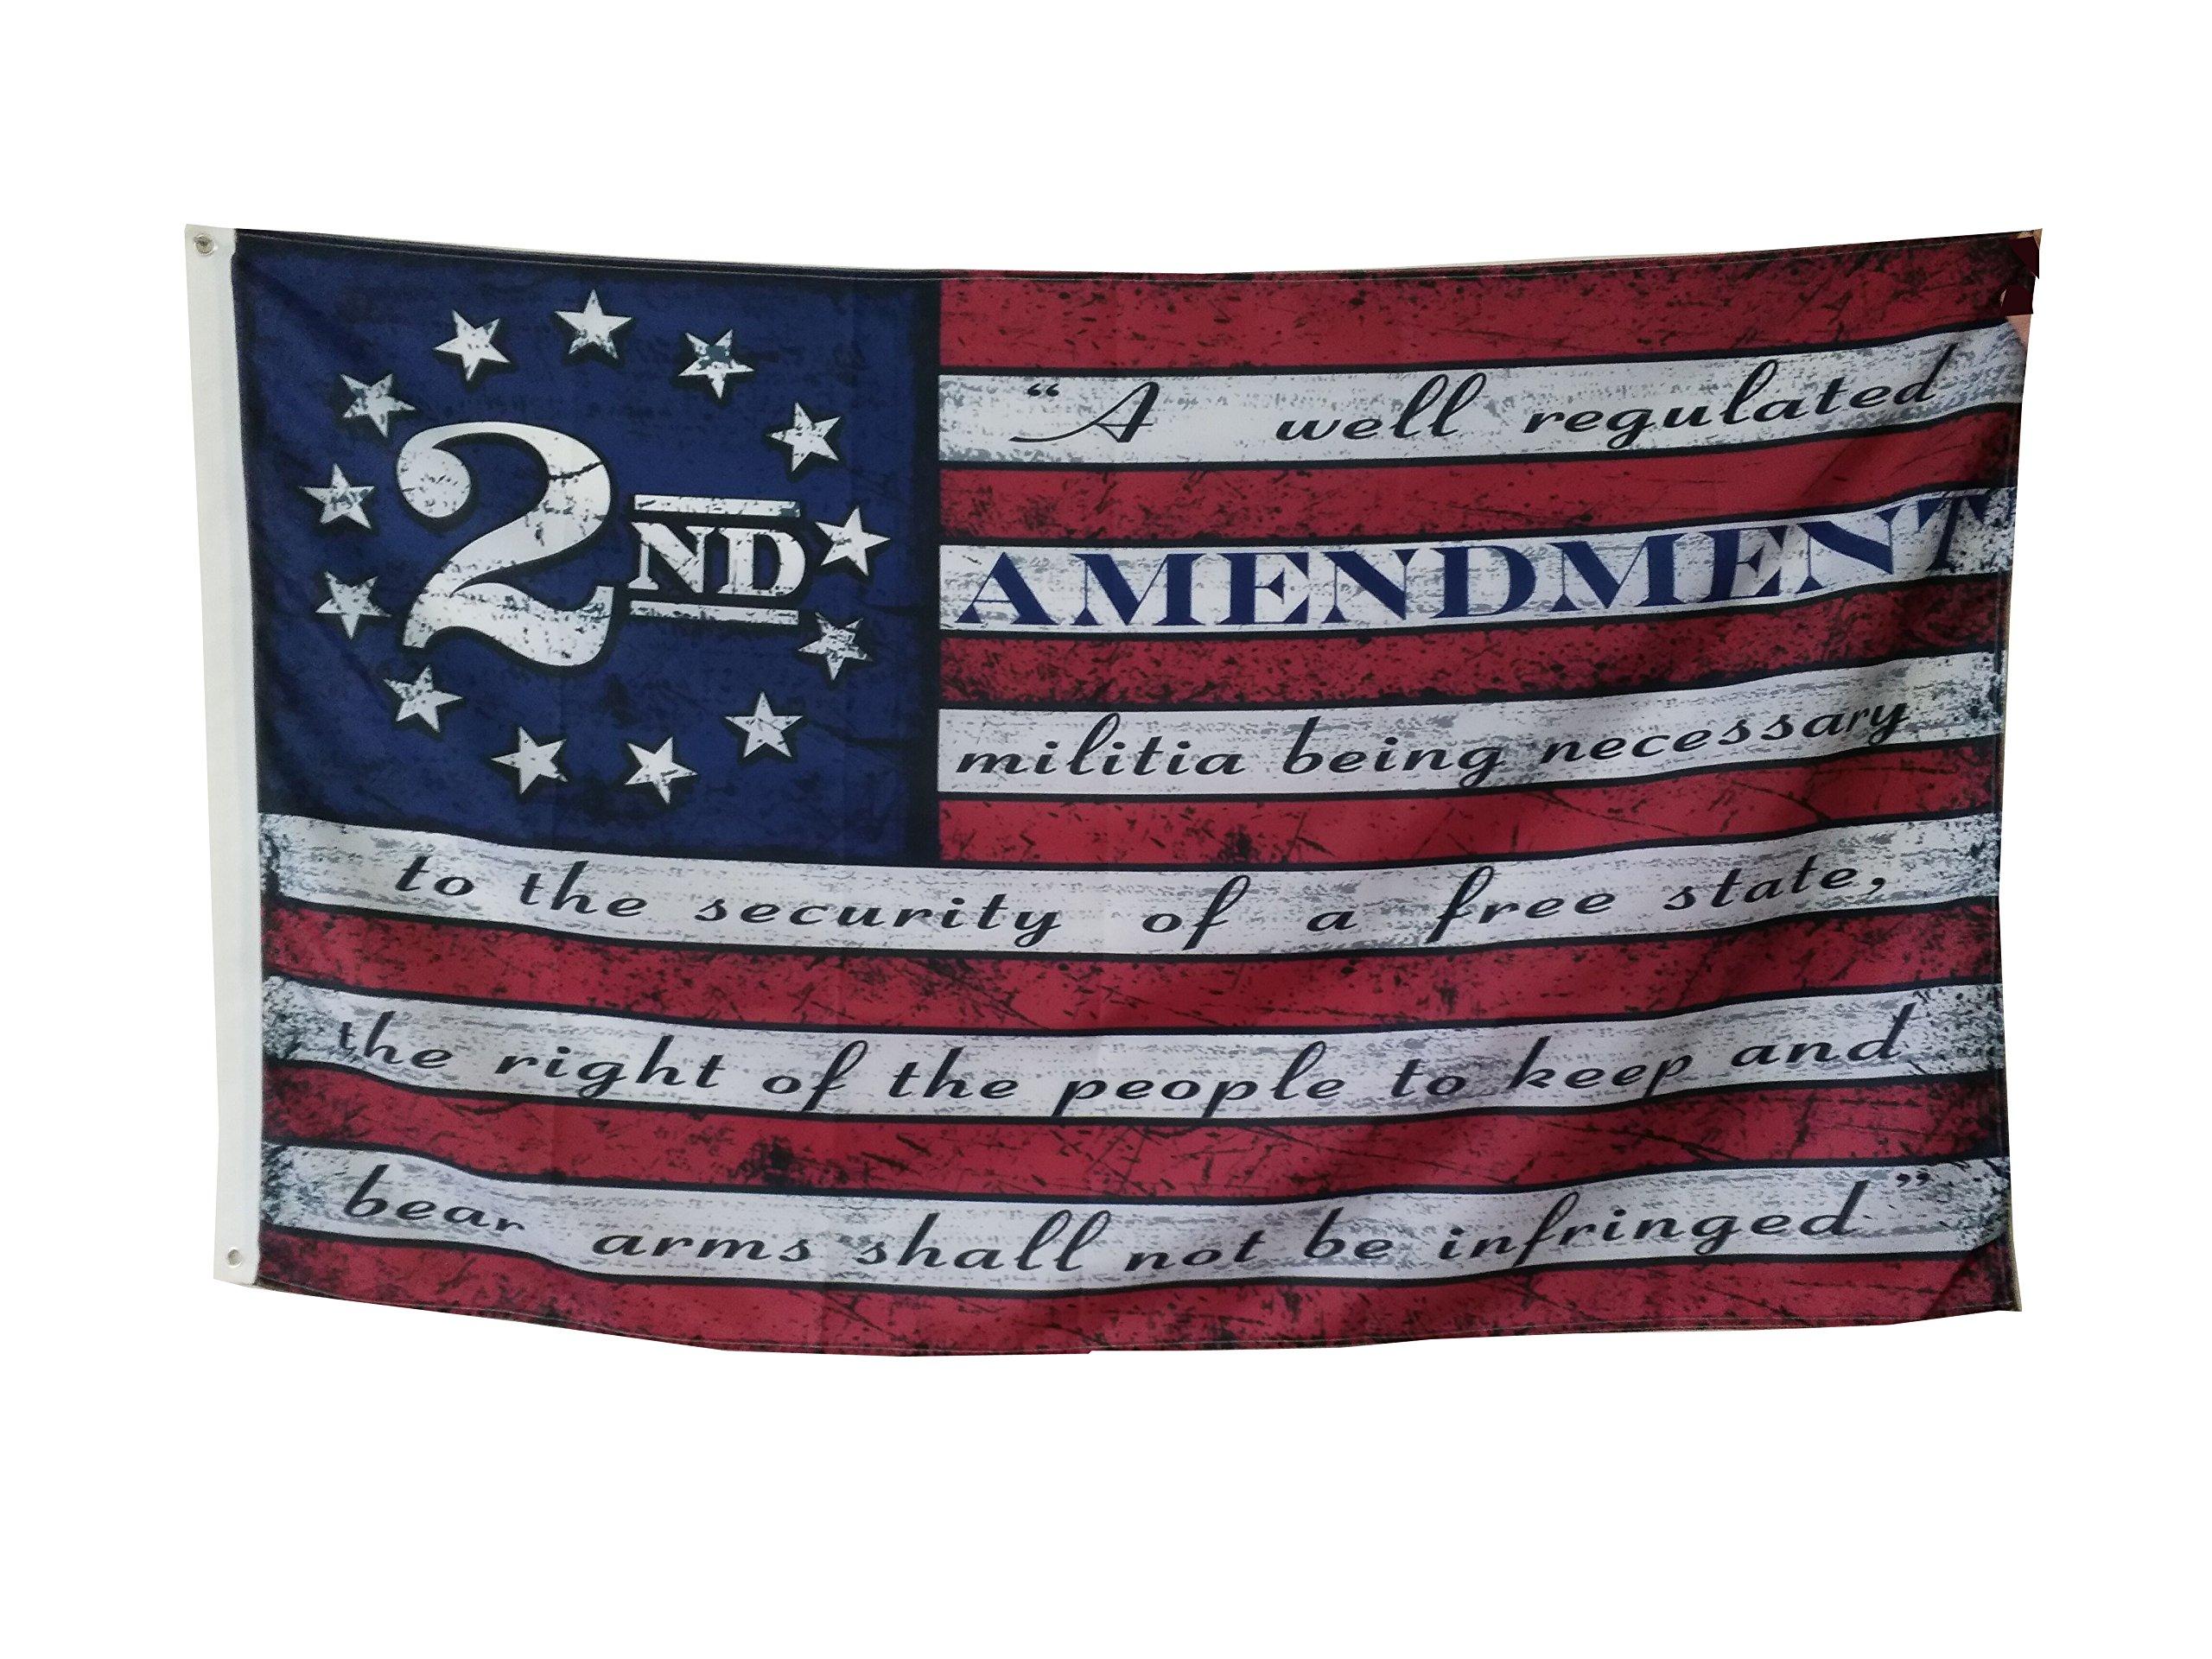 Flylong Second 2nd Amendment Vintage American Flag Banner USA Second 2A Man Cave Decor 3X5 Feet by Flylong